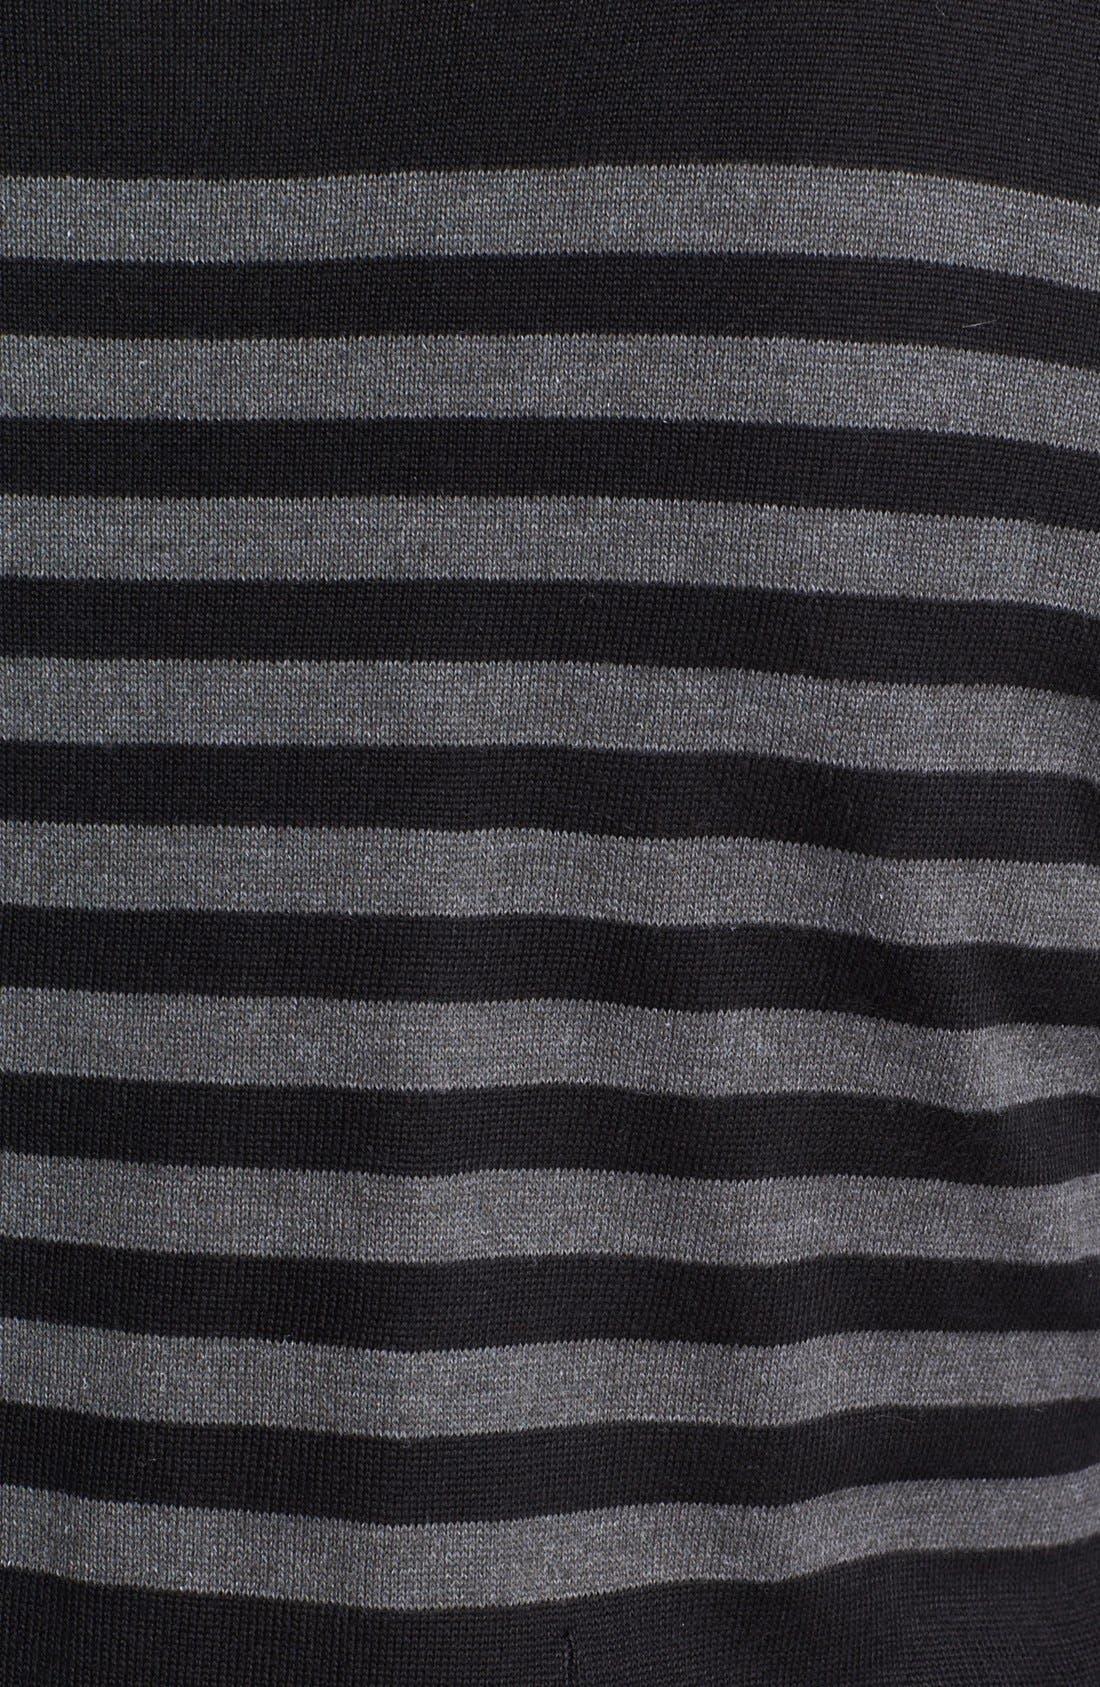 Alternate Image 3  - Eliza J Fit & Flare Sweater Dress (Plus Size)